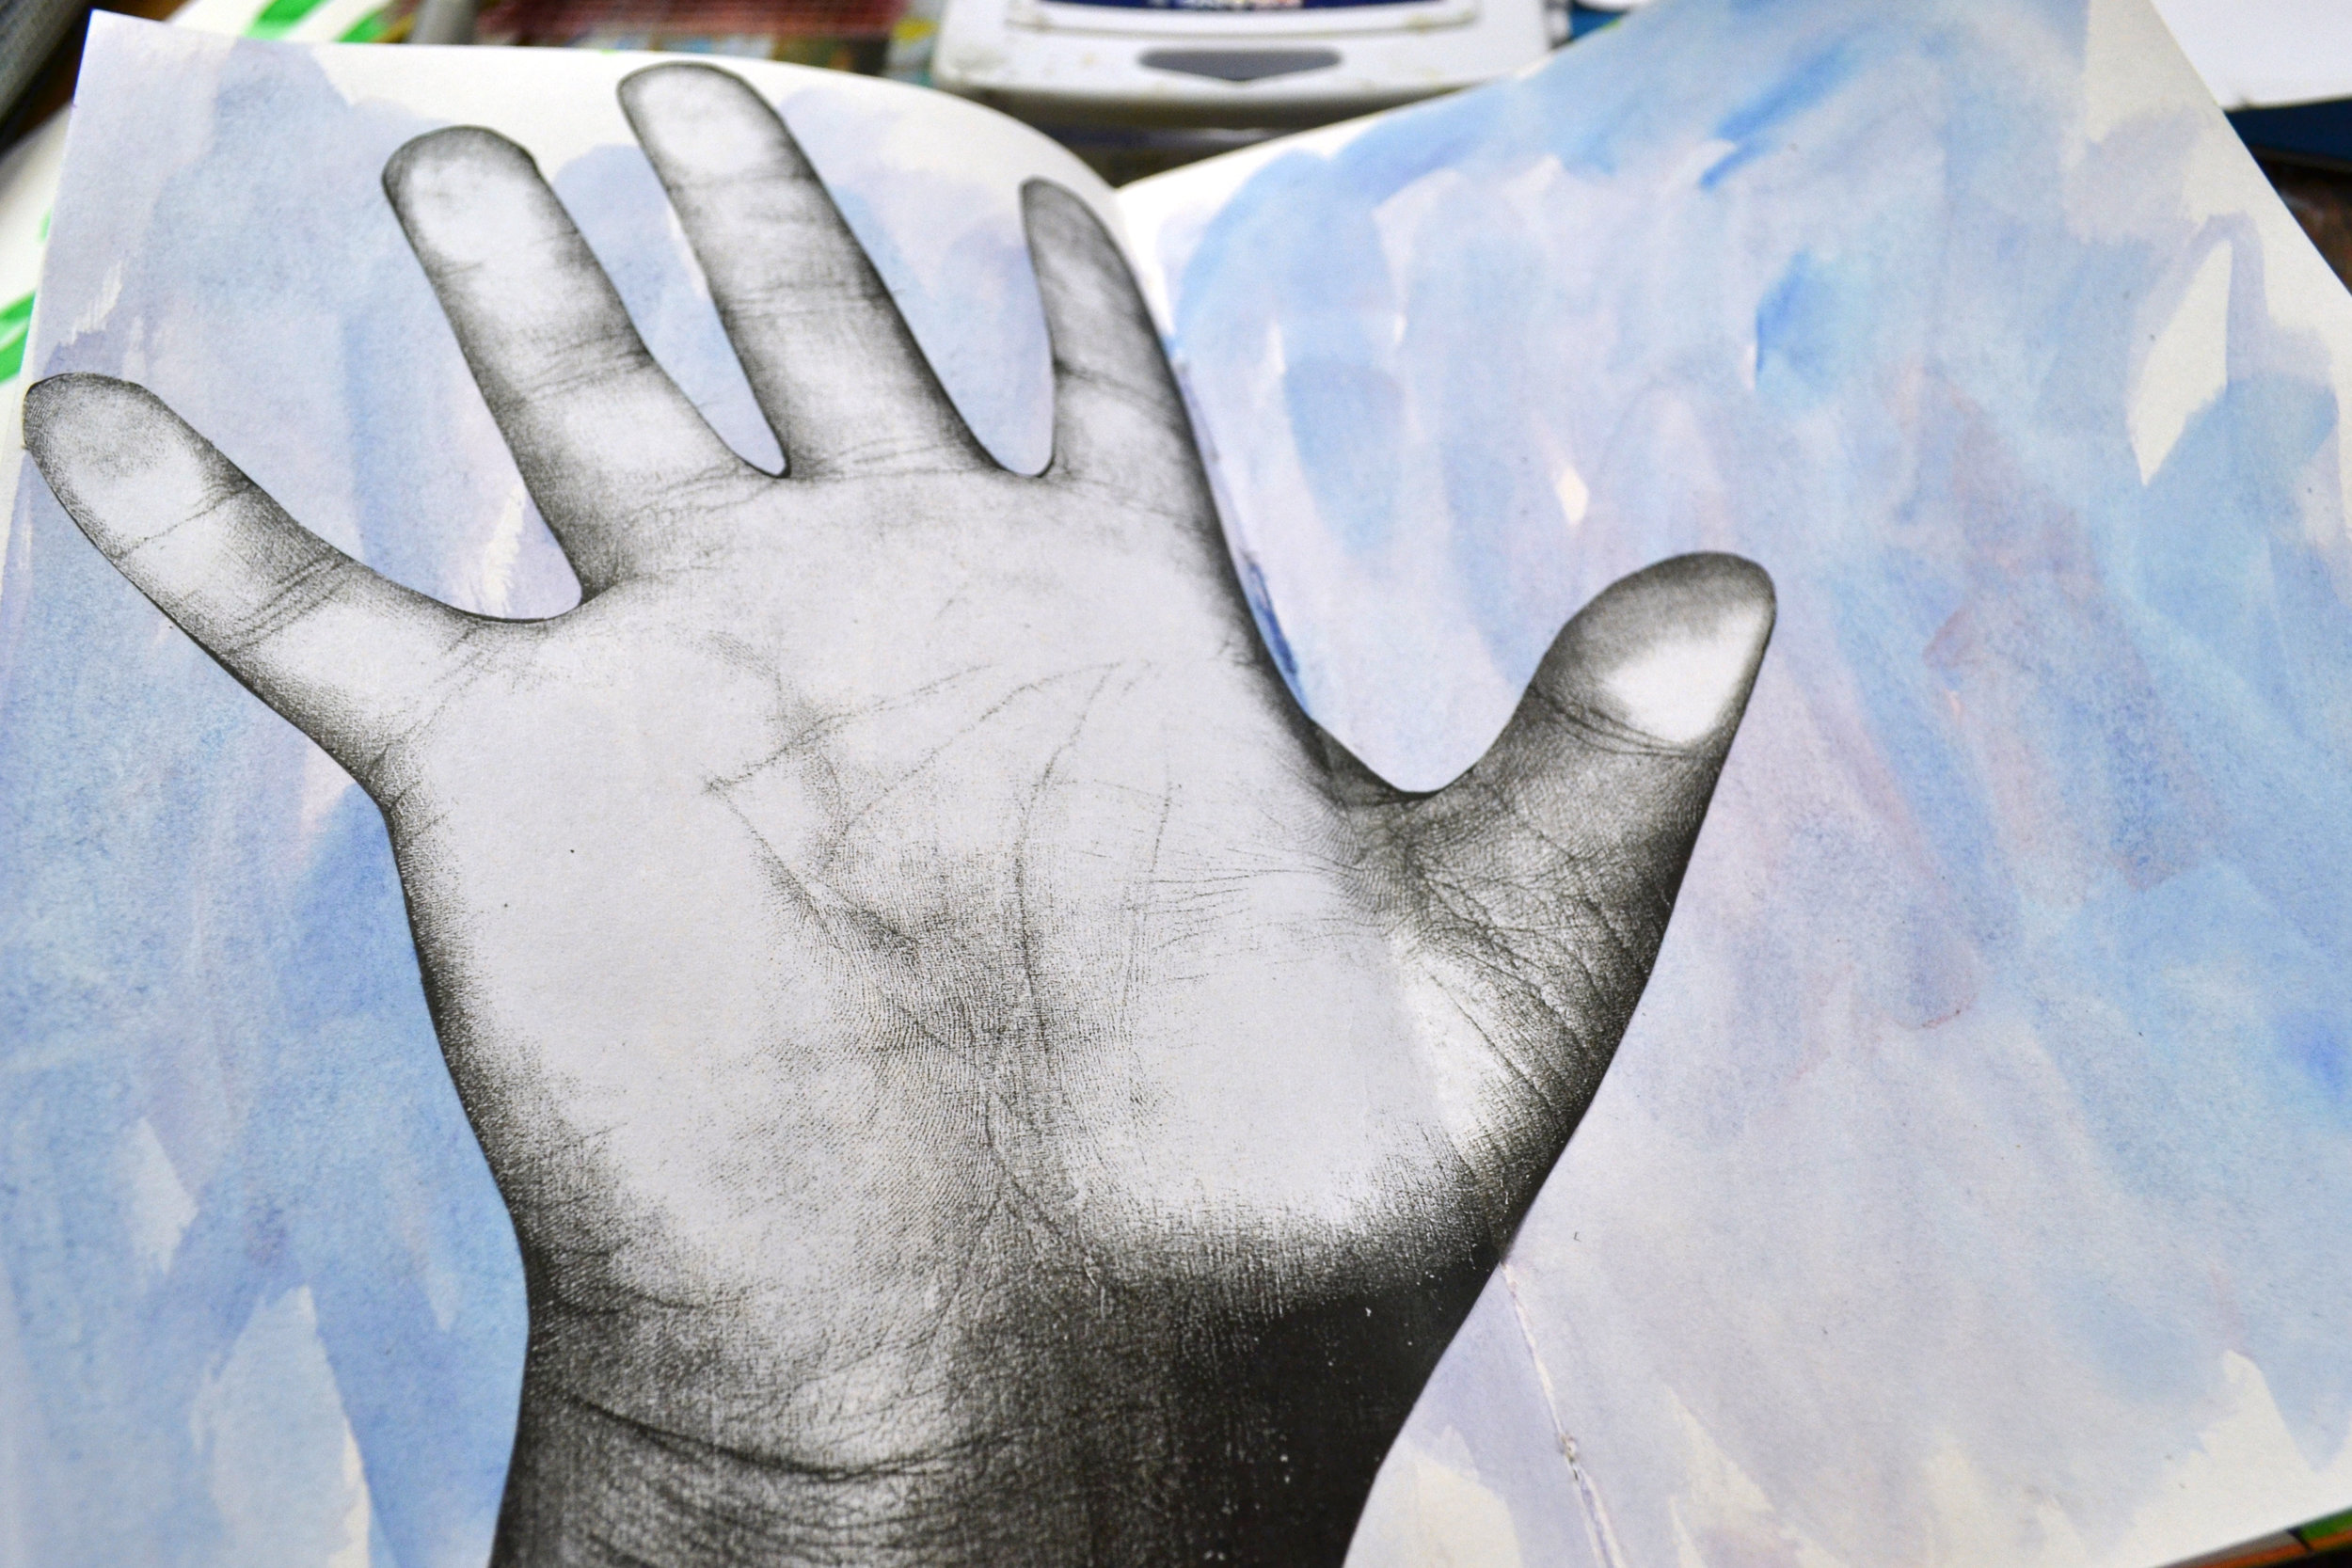 Photocopy Hands